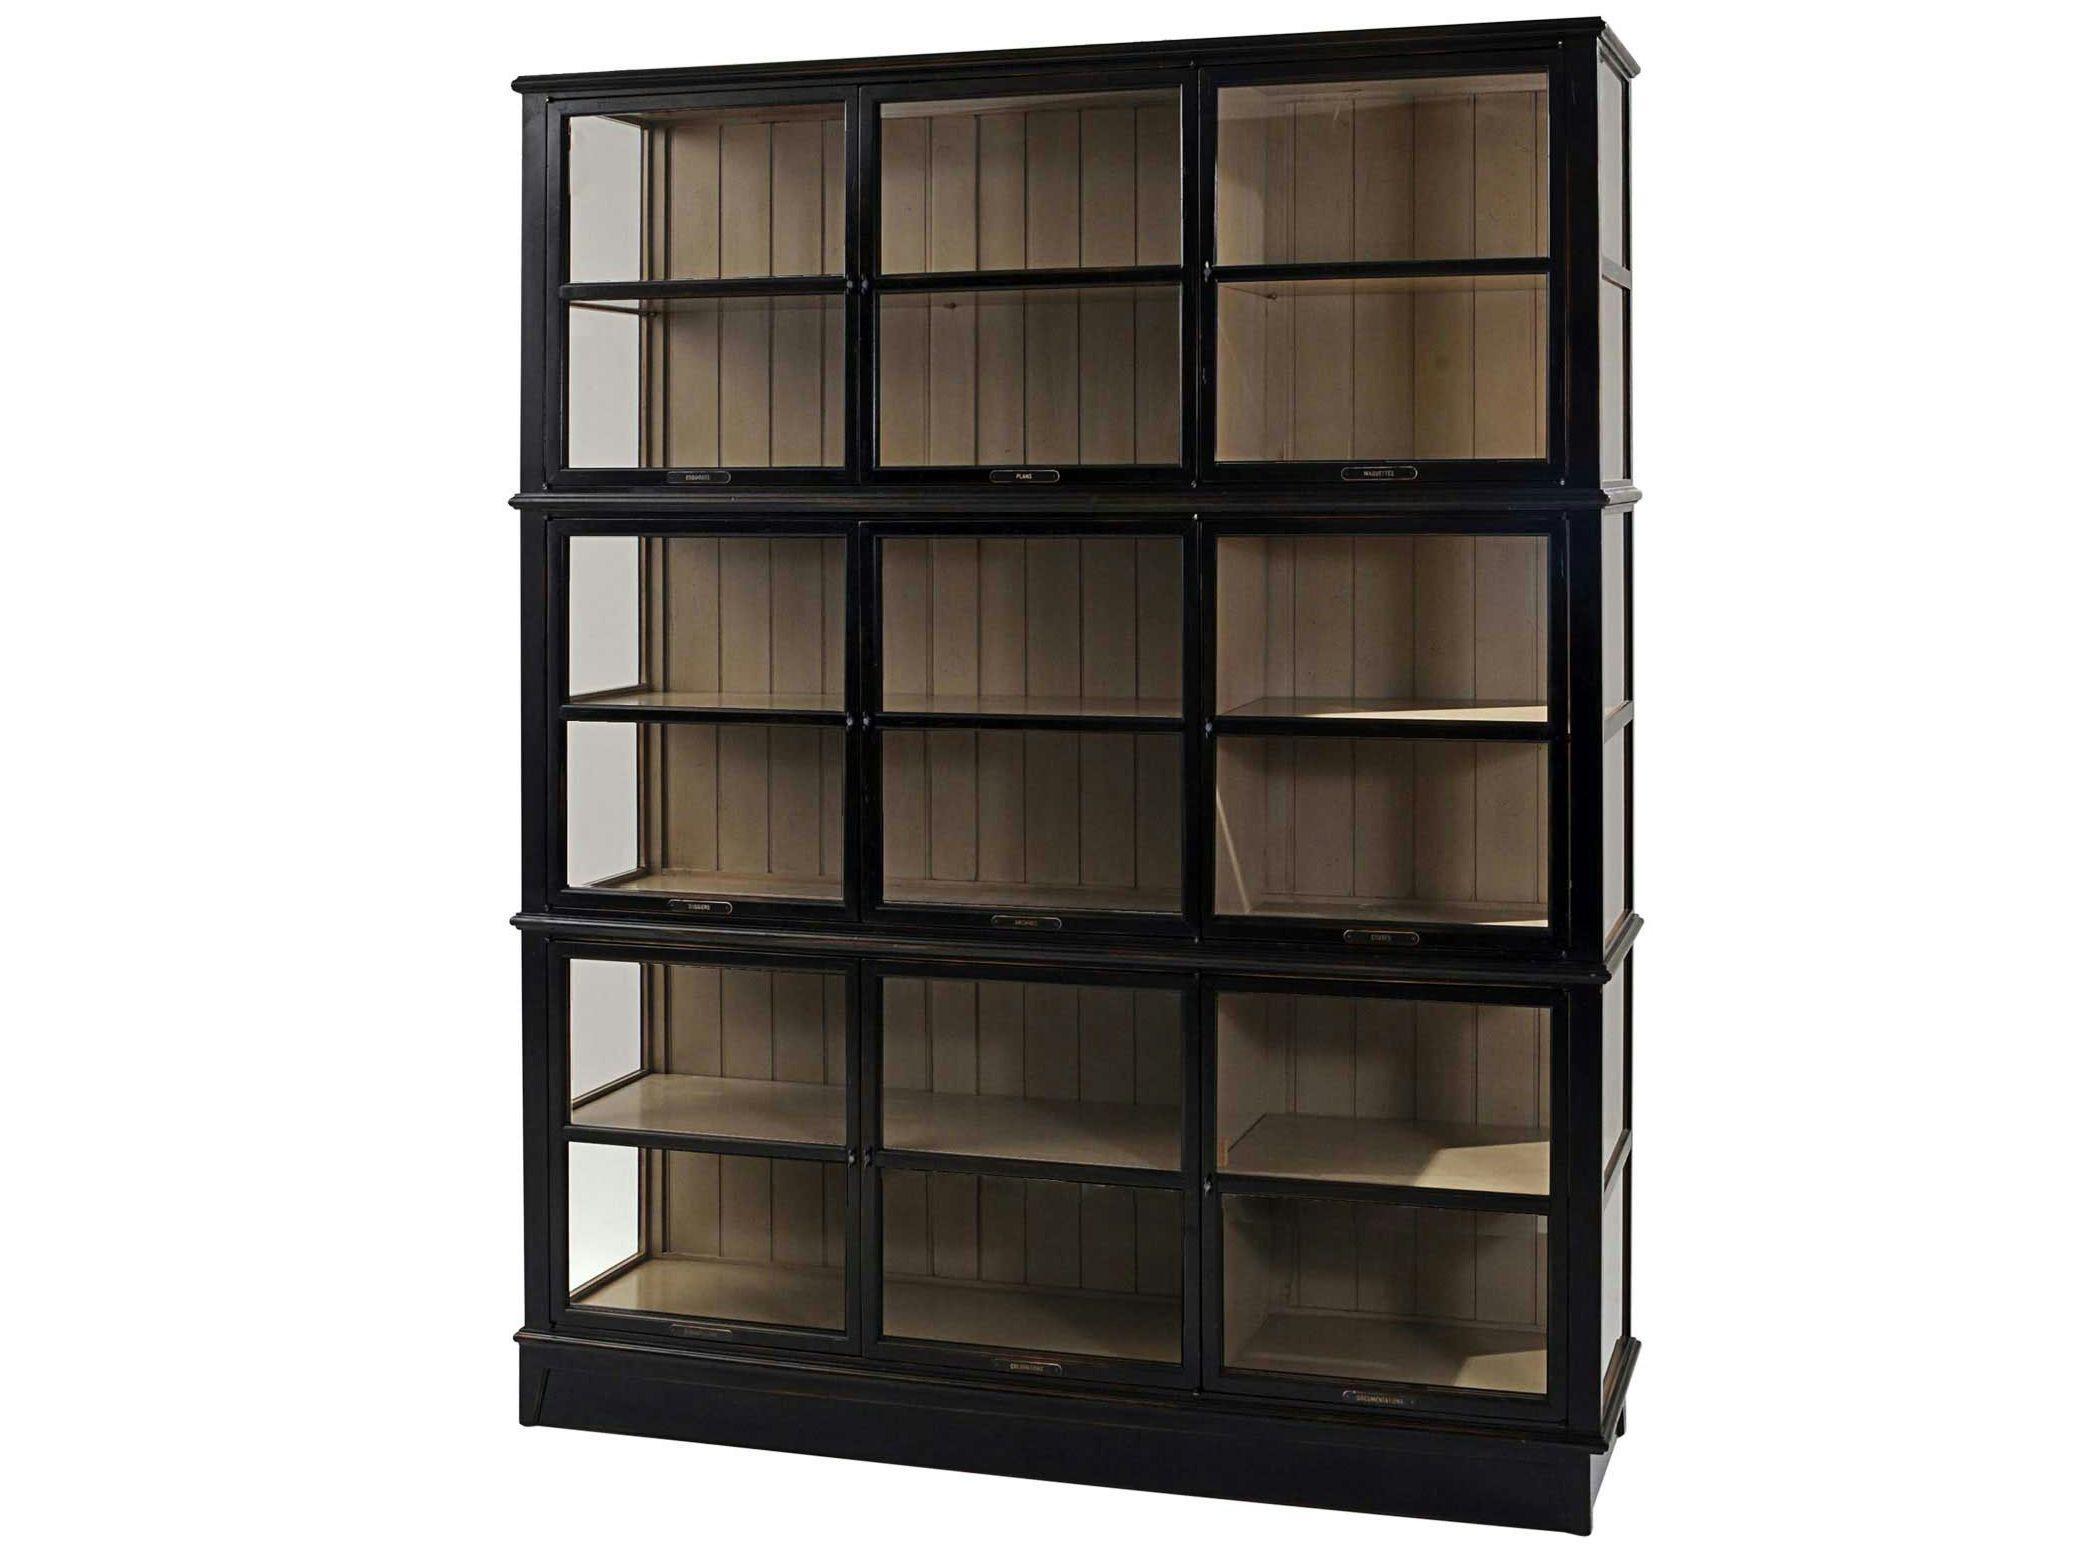 medium resolution of architecte cherry wood display cabinet by roche bobois